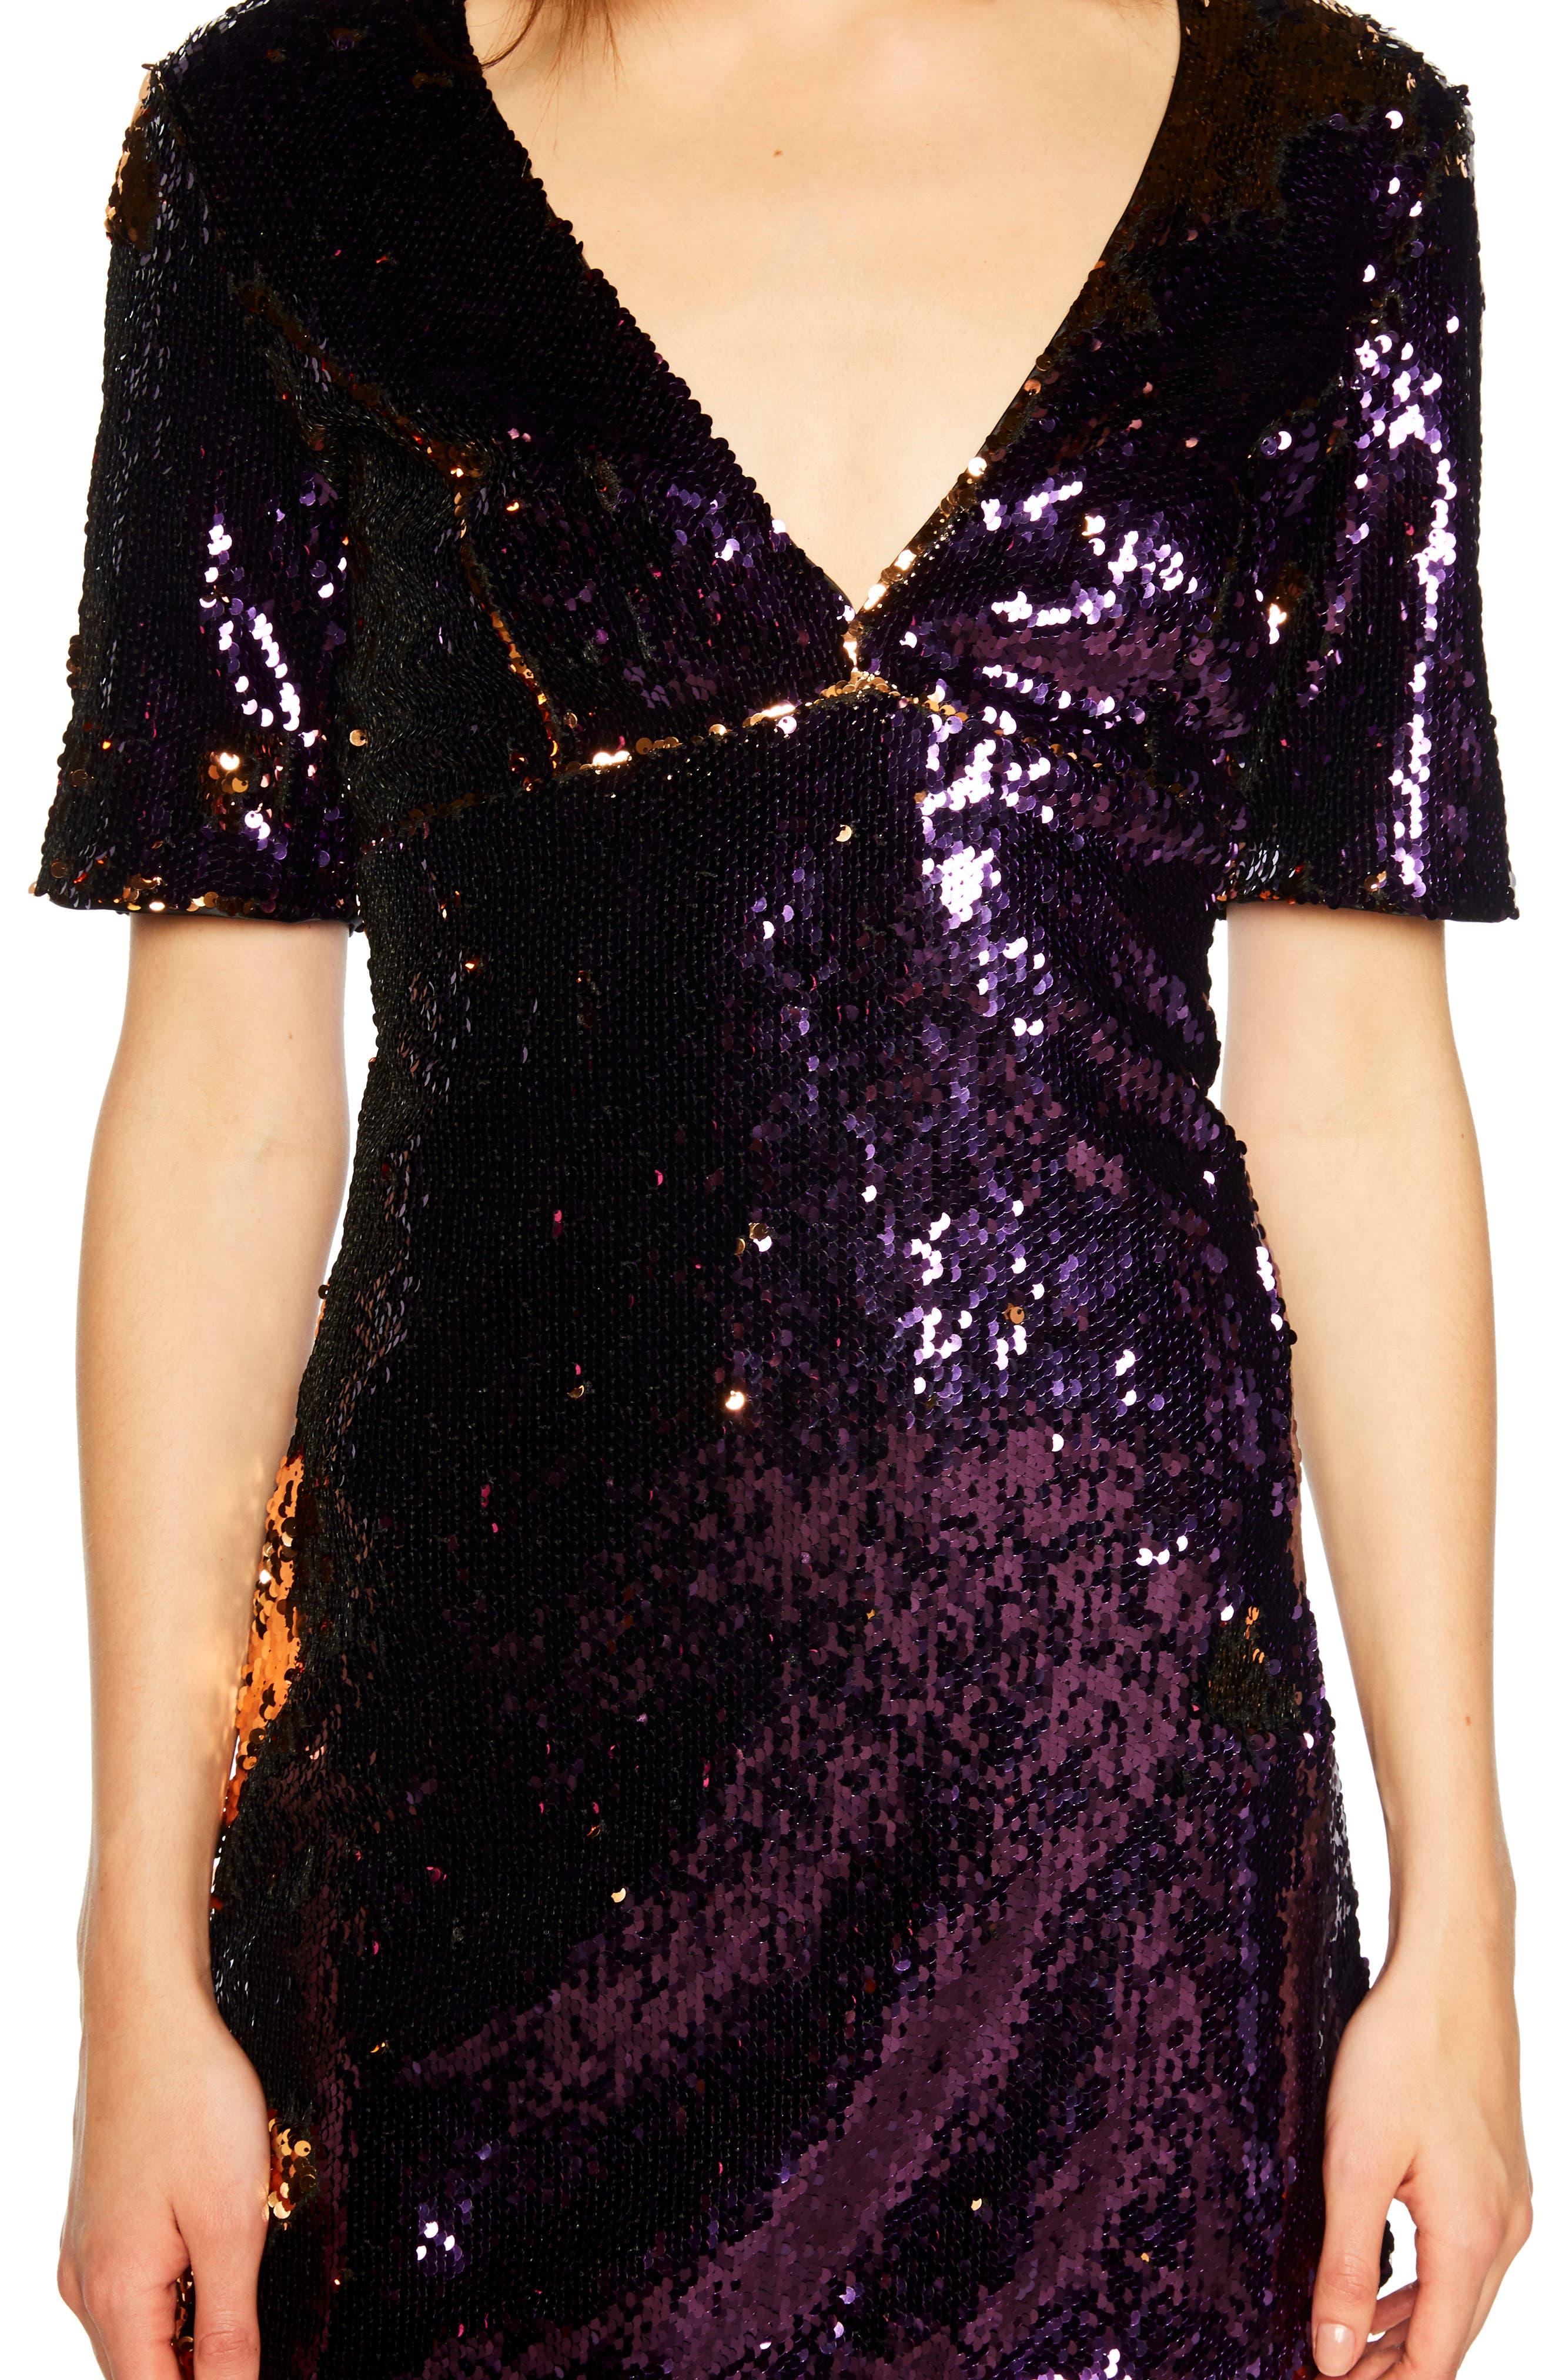 Sequin Embellished Dress,                             Alternate thumbnail 4, color,                             GOLD/ PURPLE